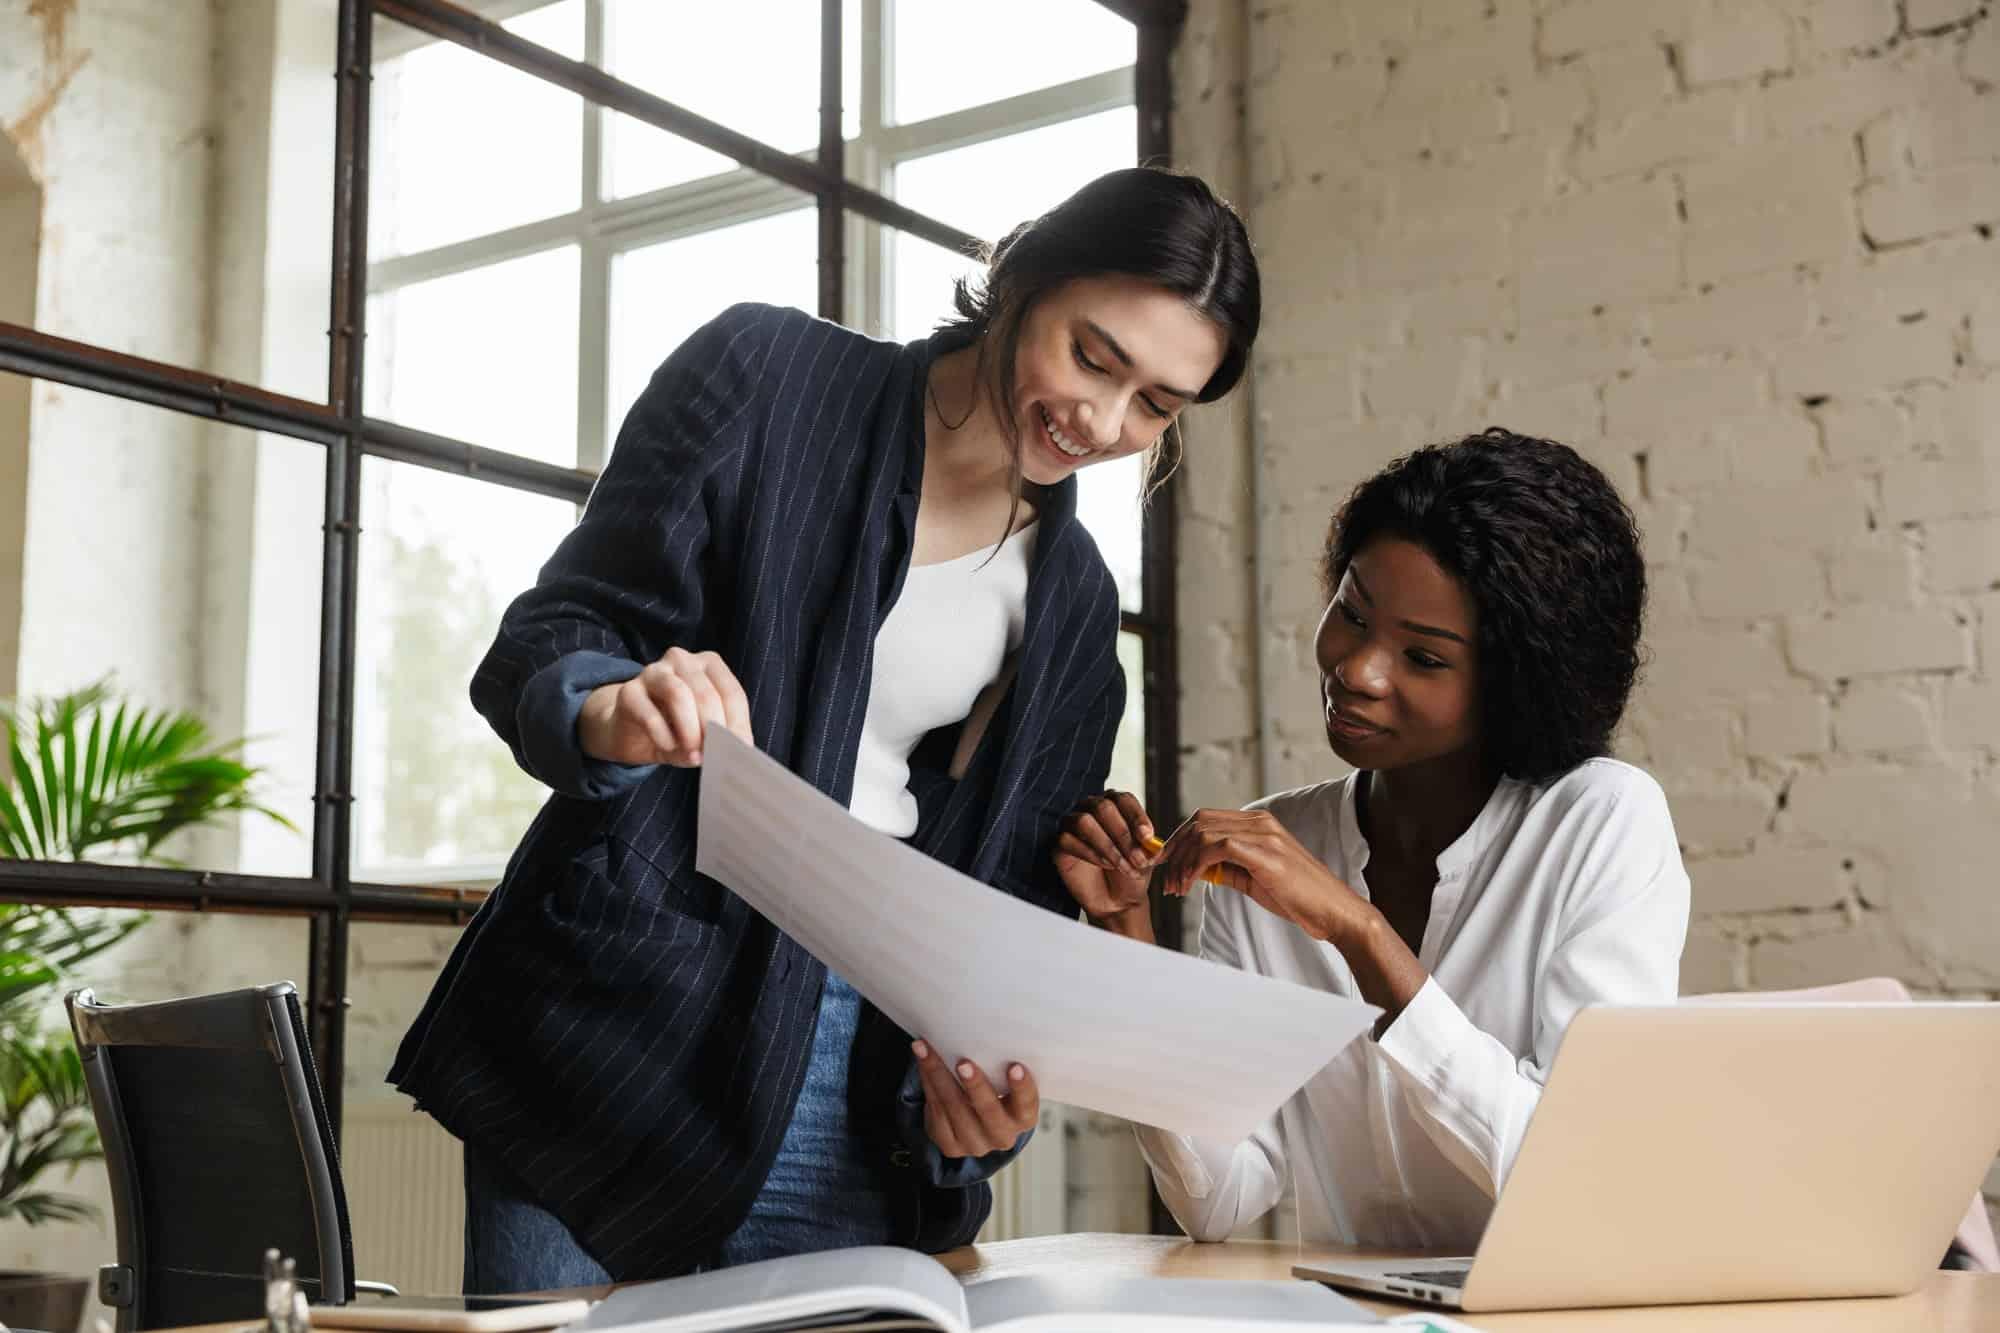 Confident smart women entrepreneurs working